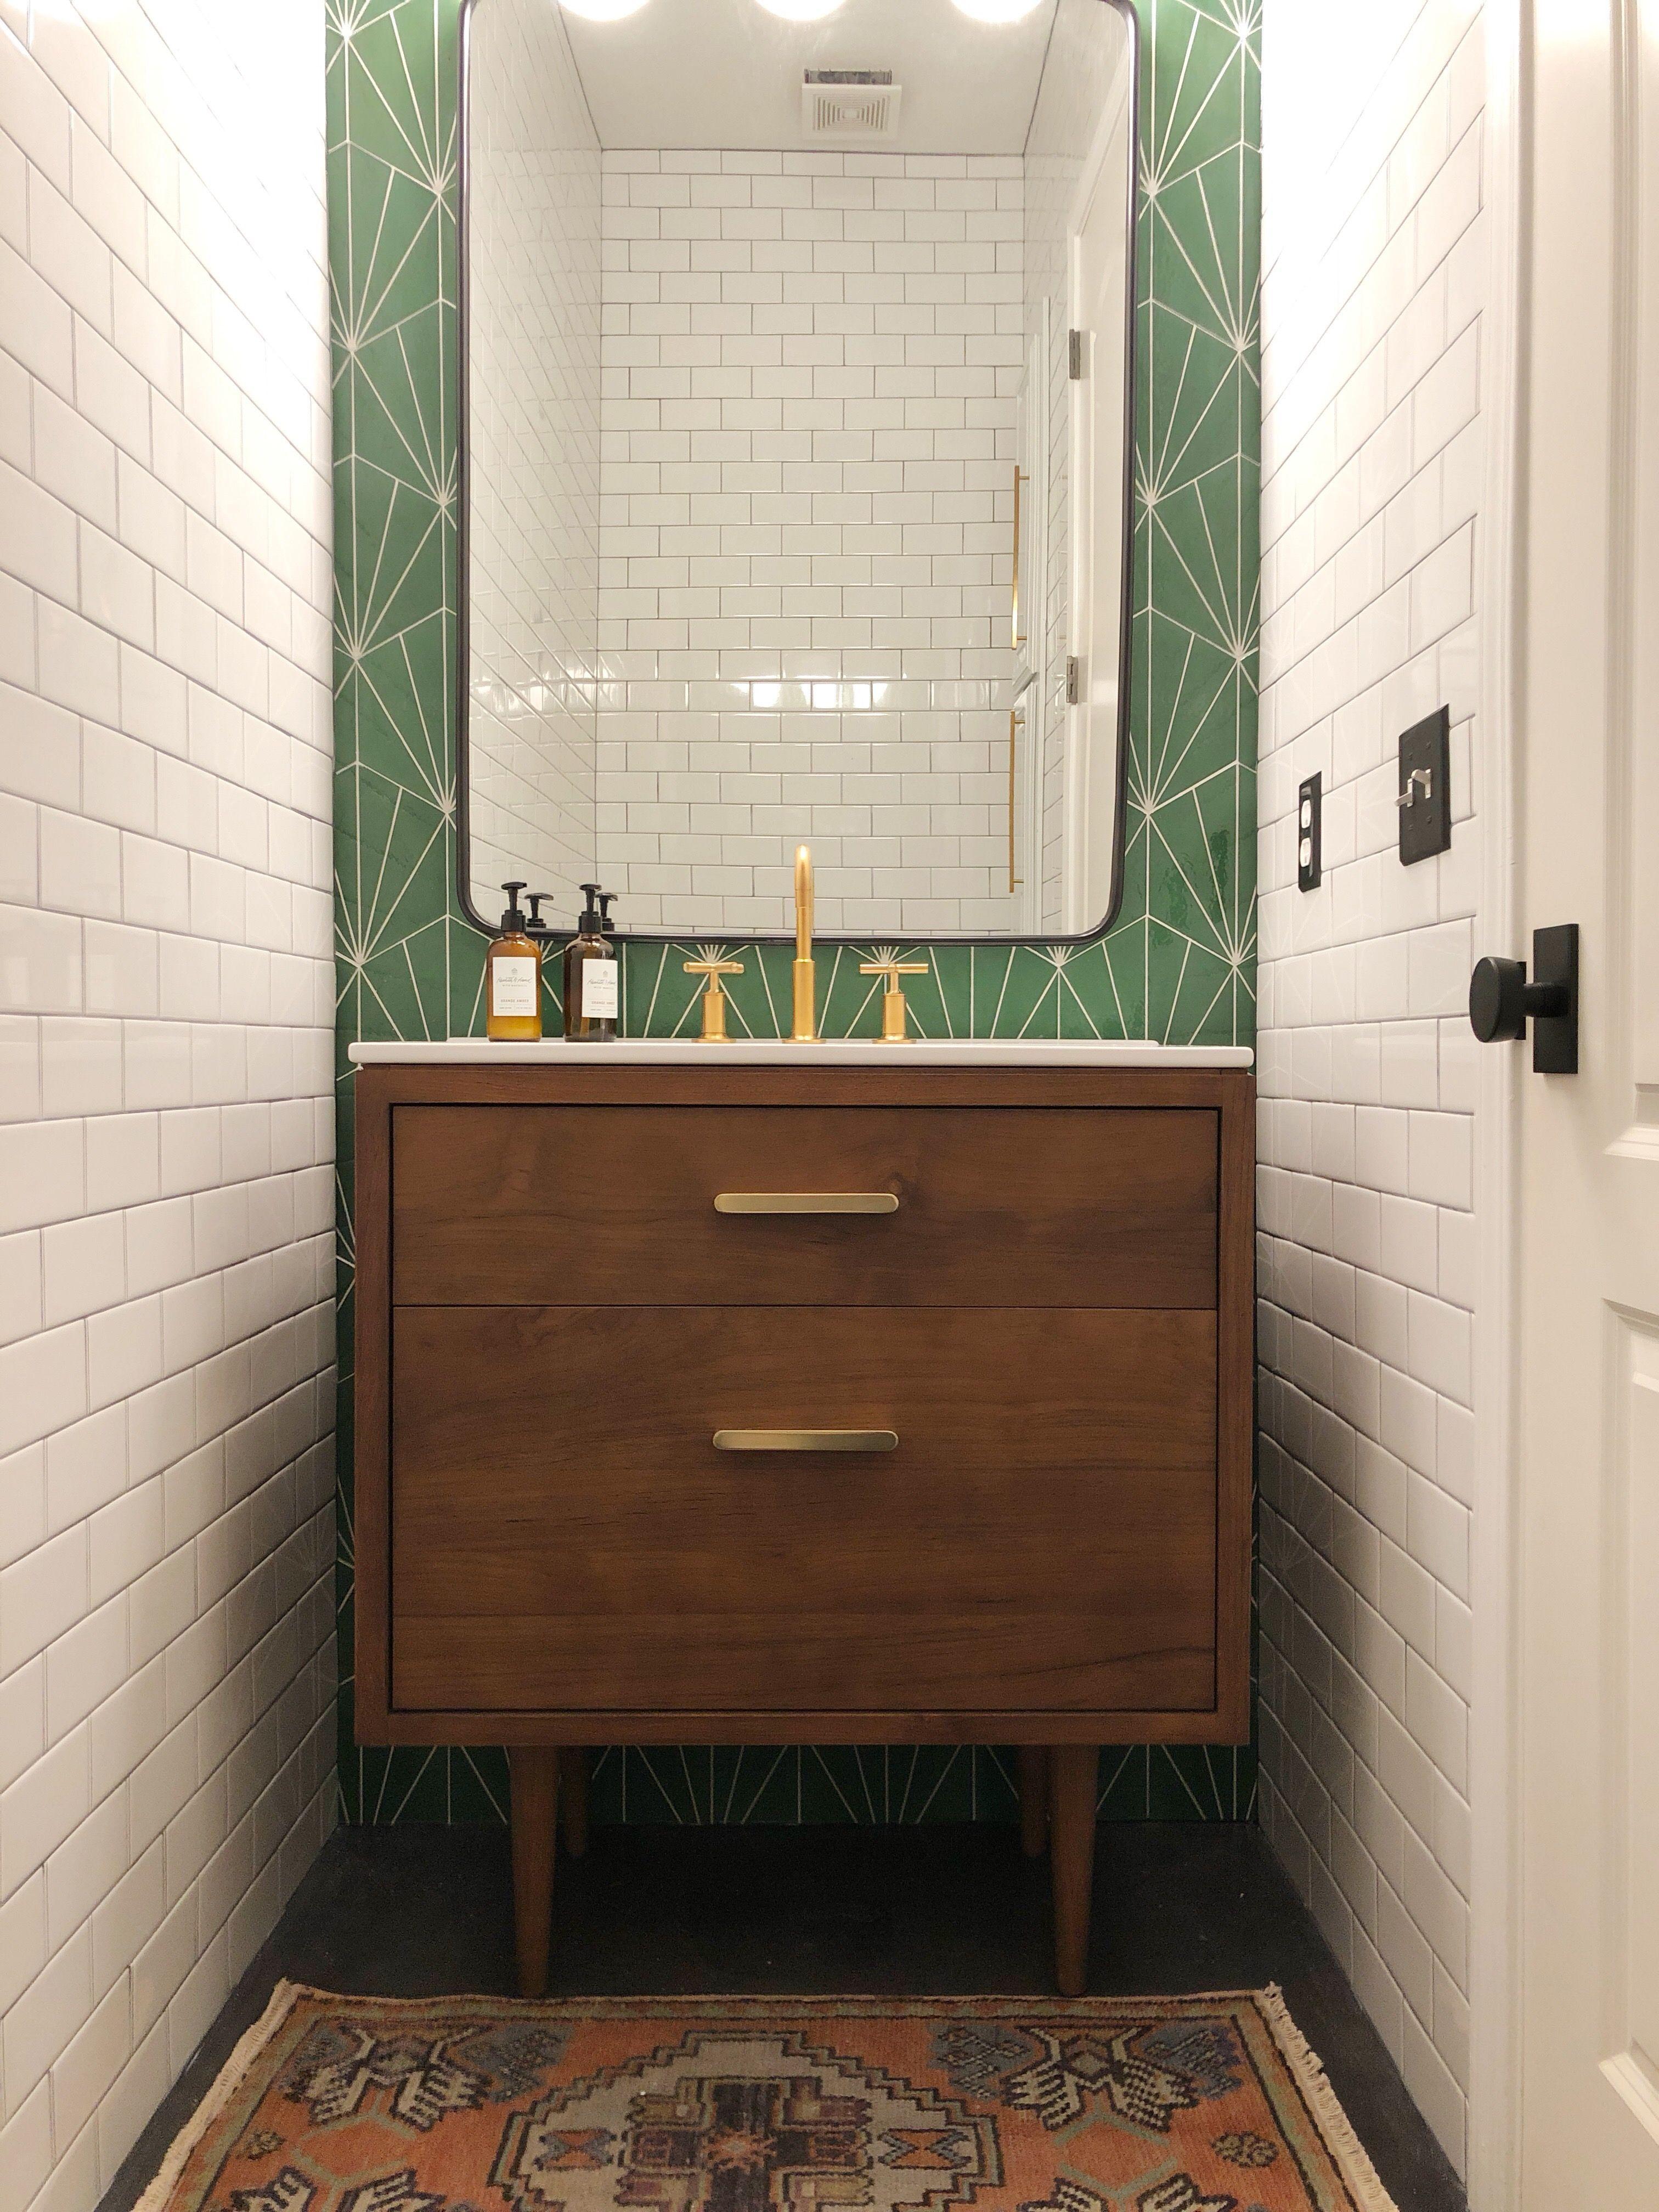 Cement Bathroom Vanity Cement Bathroom Small Bathroom Ideas Pictures Small Bathroom Remo Half Bath Remodel Bath Remodel Small Half Bath [ 4032 x 3024 Pixel ]